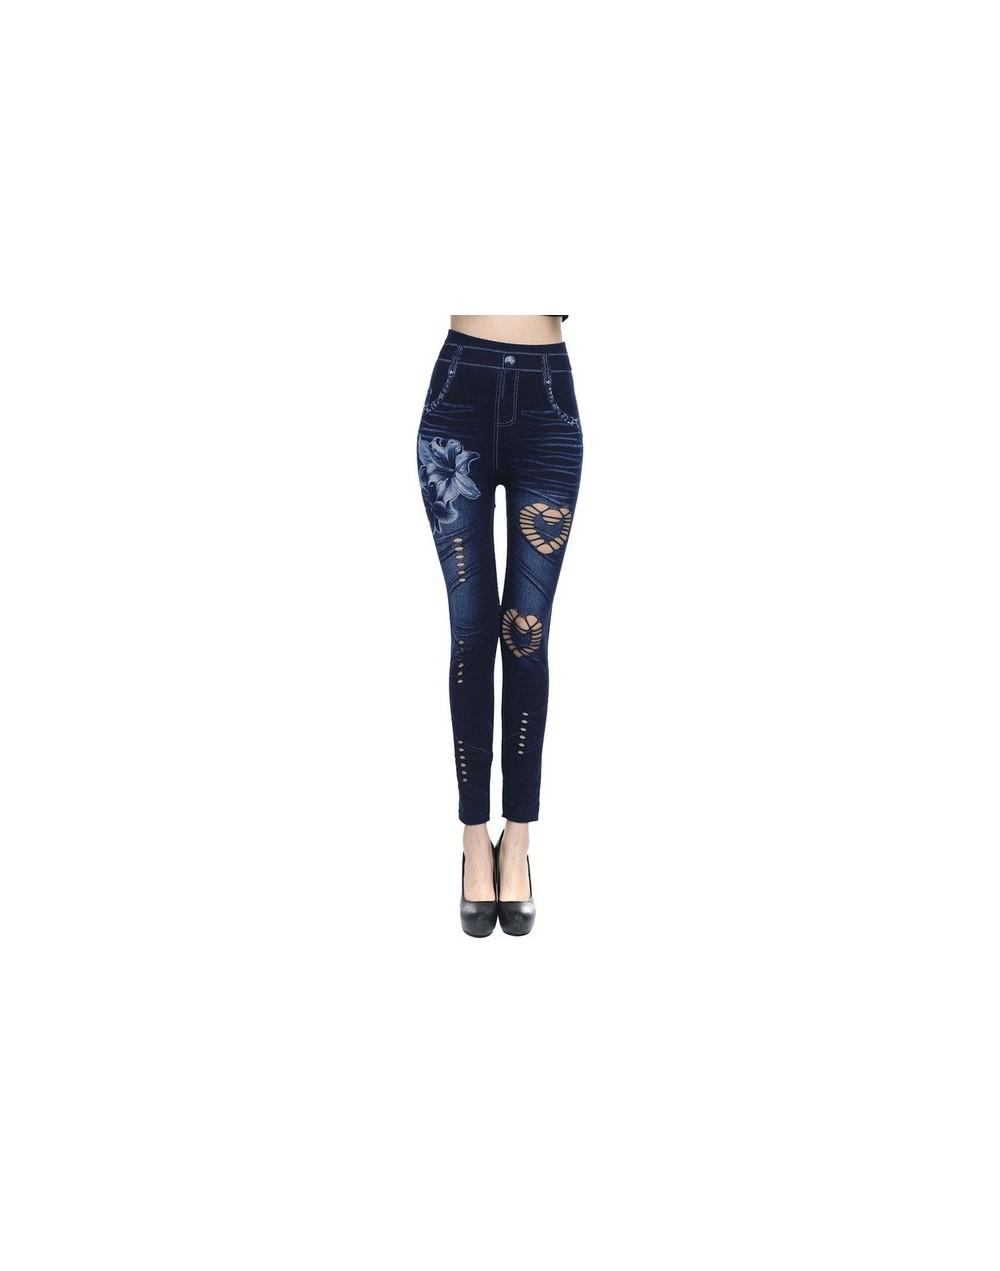 2019 Plus Size Women Stretch High Waist Skinny Embroidery Jeans Floral Holes Denim Pants Trousers Women Jeans Pencil Pant - ...